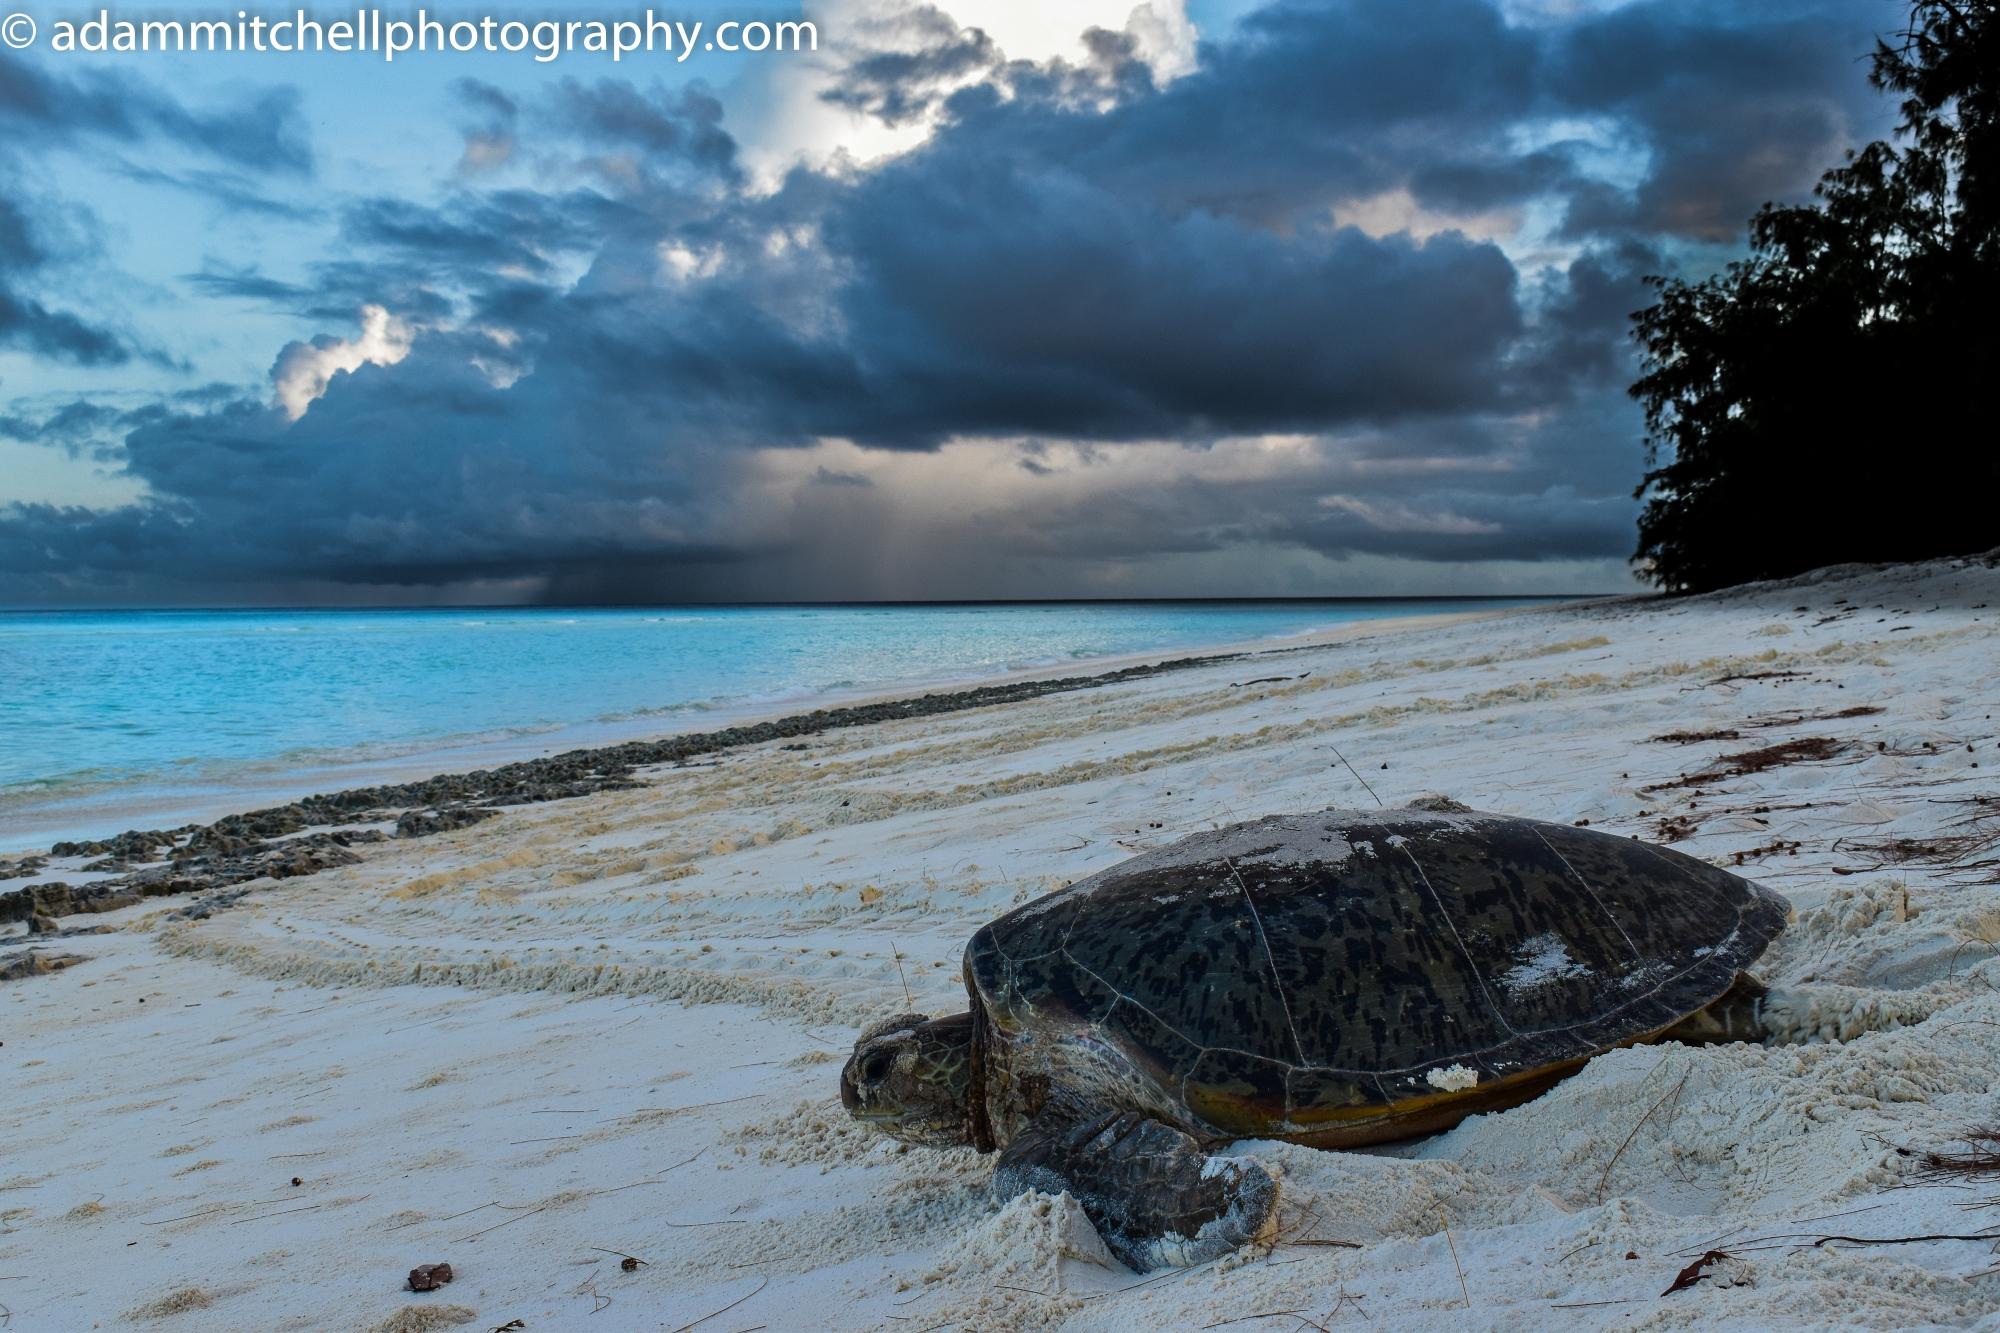 Nesting green turtle, Aldabra